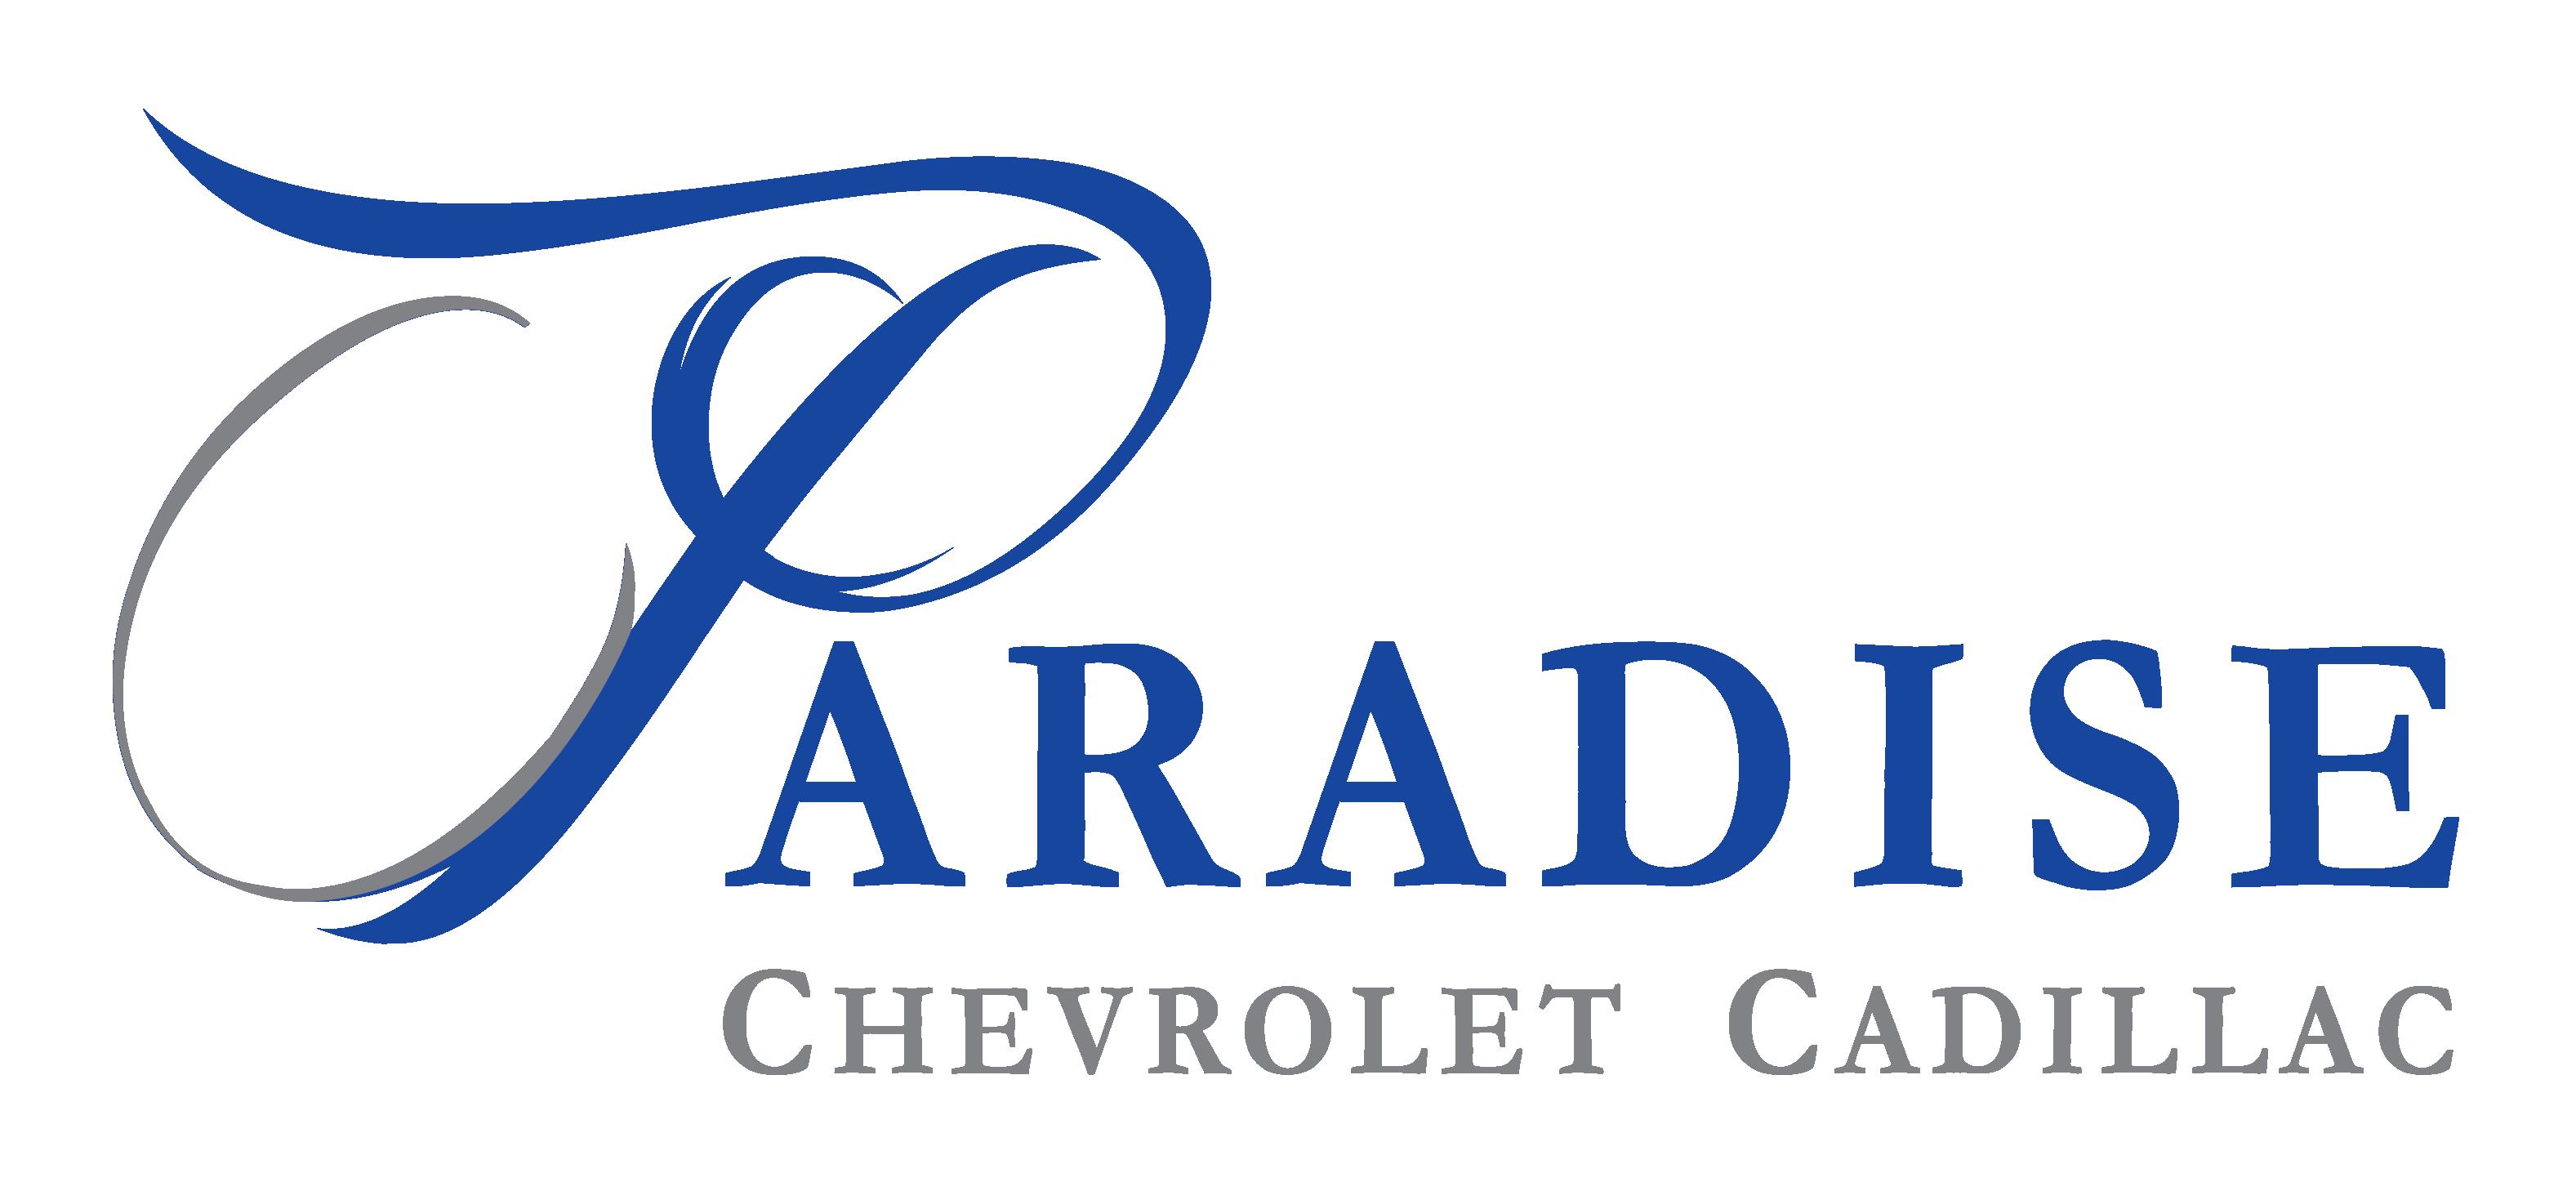 Lake Elsinore Dodge >> Paradise Chevrolet-Cadillac | Temecula Valley Auto Mall